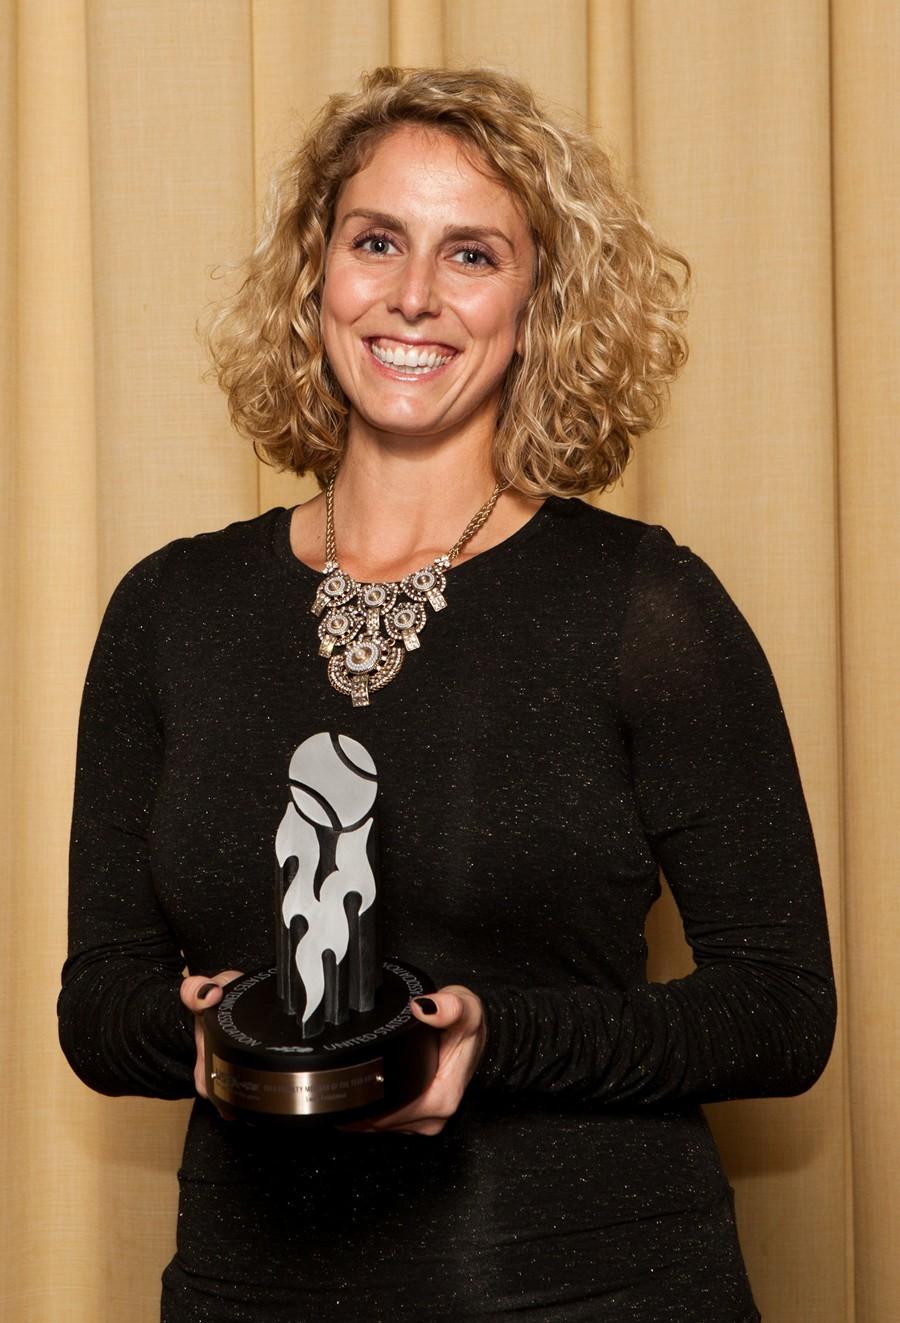 Faculty_Member_of_the_Year_Leah_Freidman,_Illinois